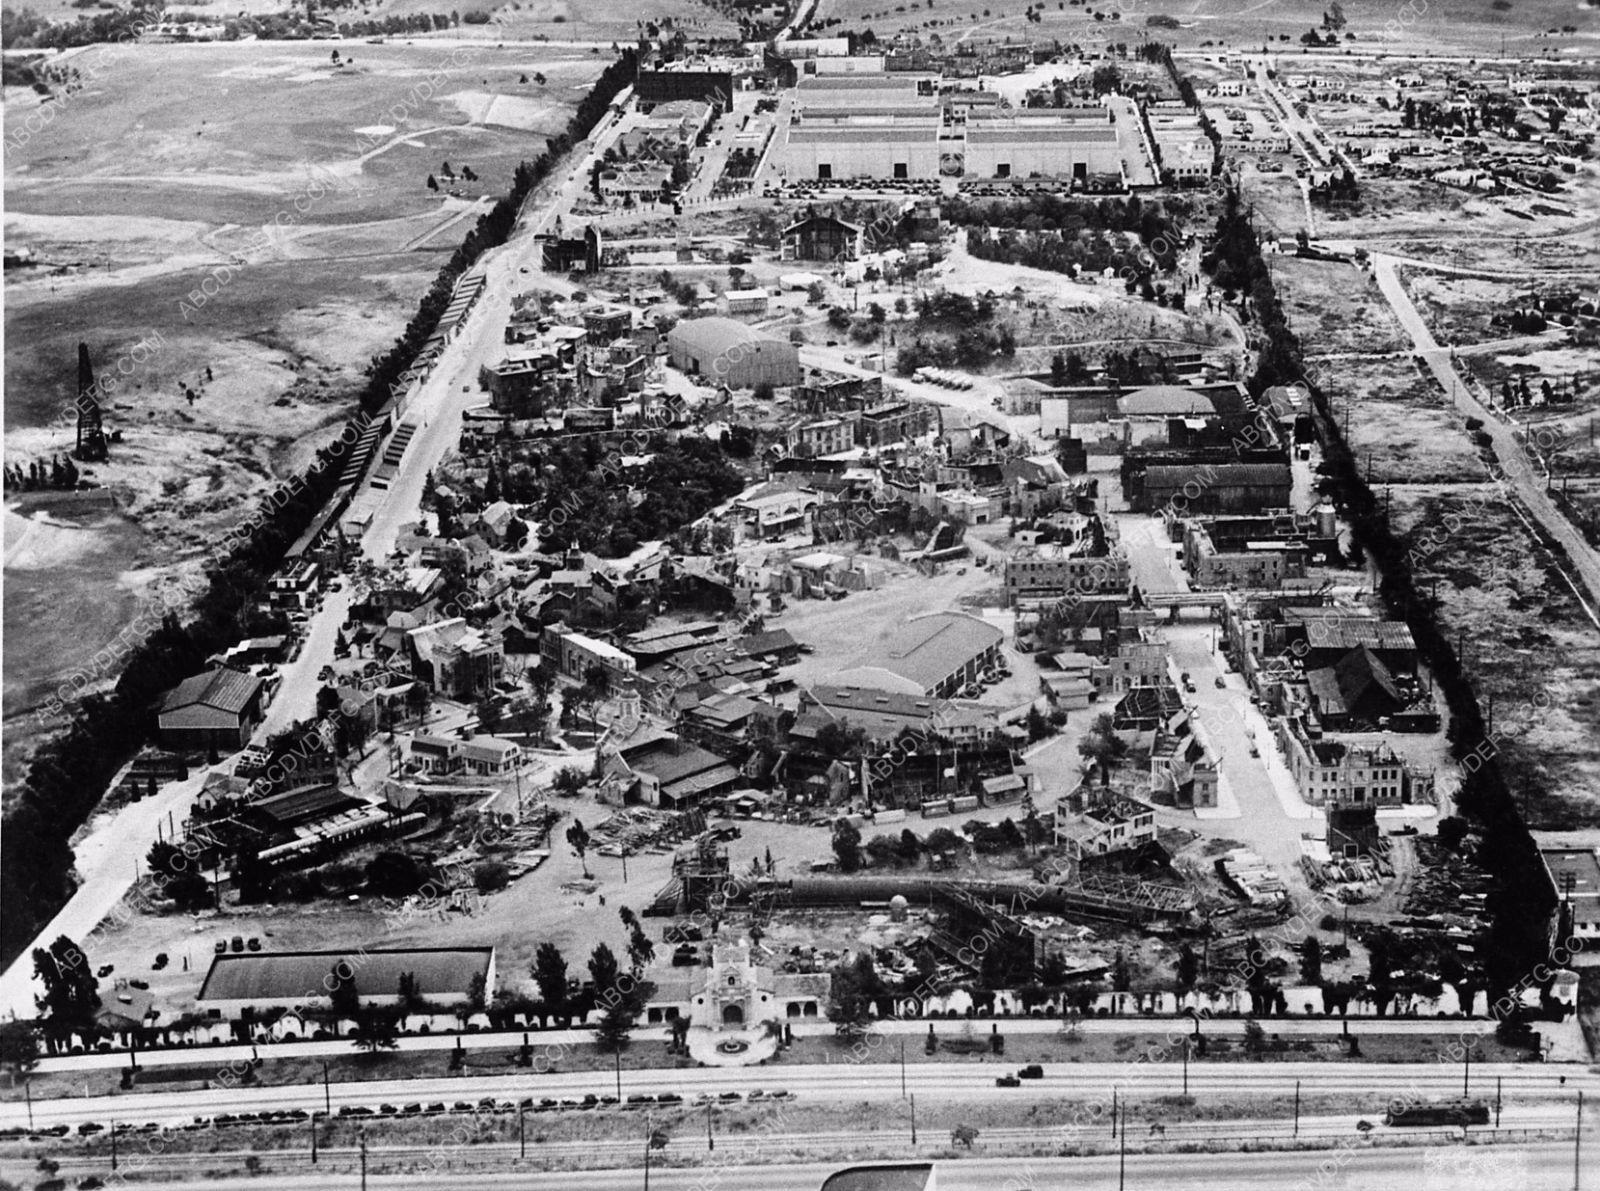 Photo Historic Los Angeles 20th Century Fox Studios Aerial Shot At Pico 2578 28 Los Angeles Architecture Hollywood Homes 20th Century Fox